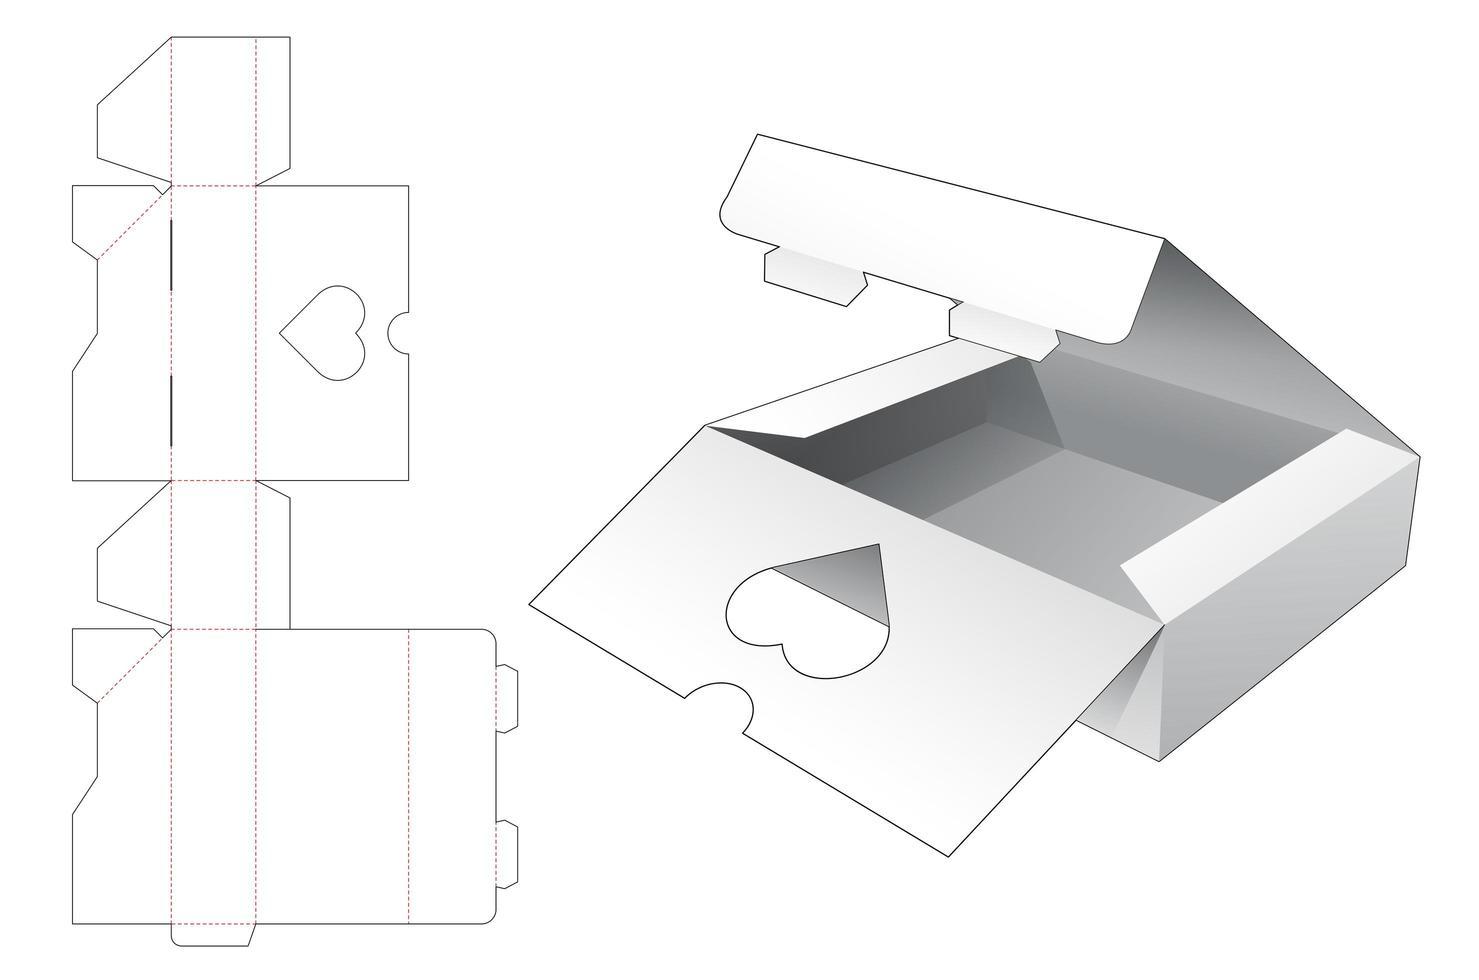 2 Flip-Top-Verpackungsbox mit Herzfenster vektor